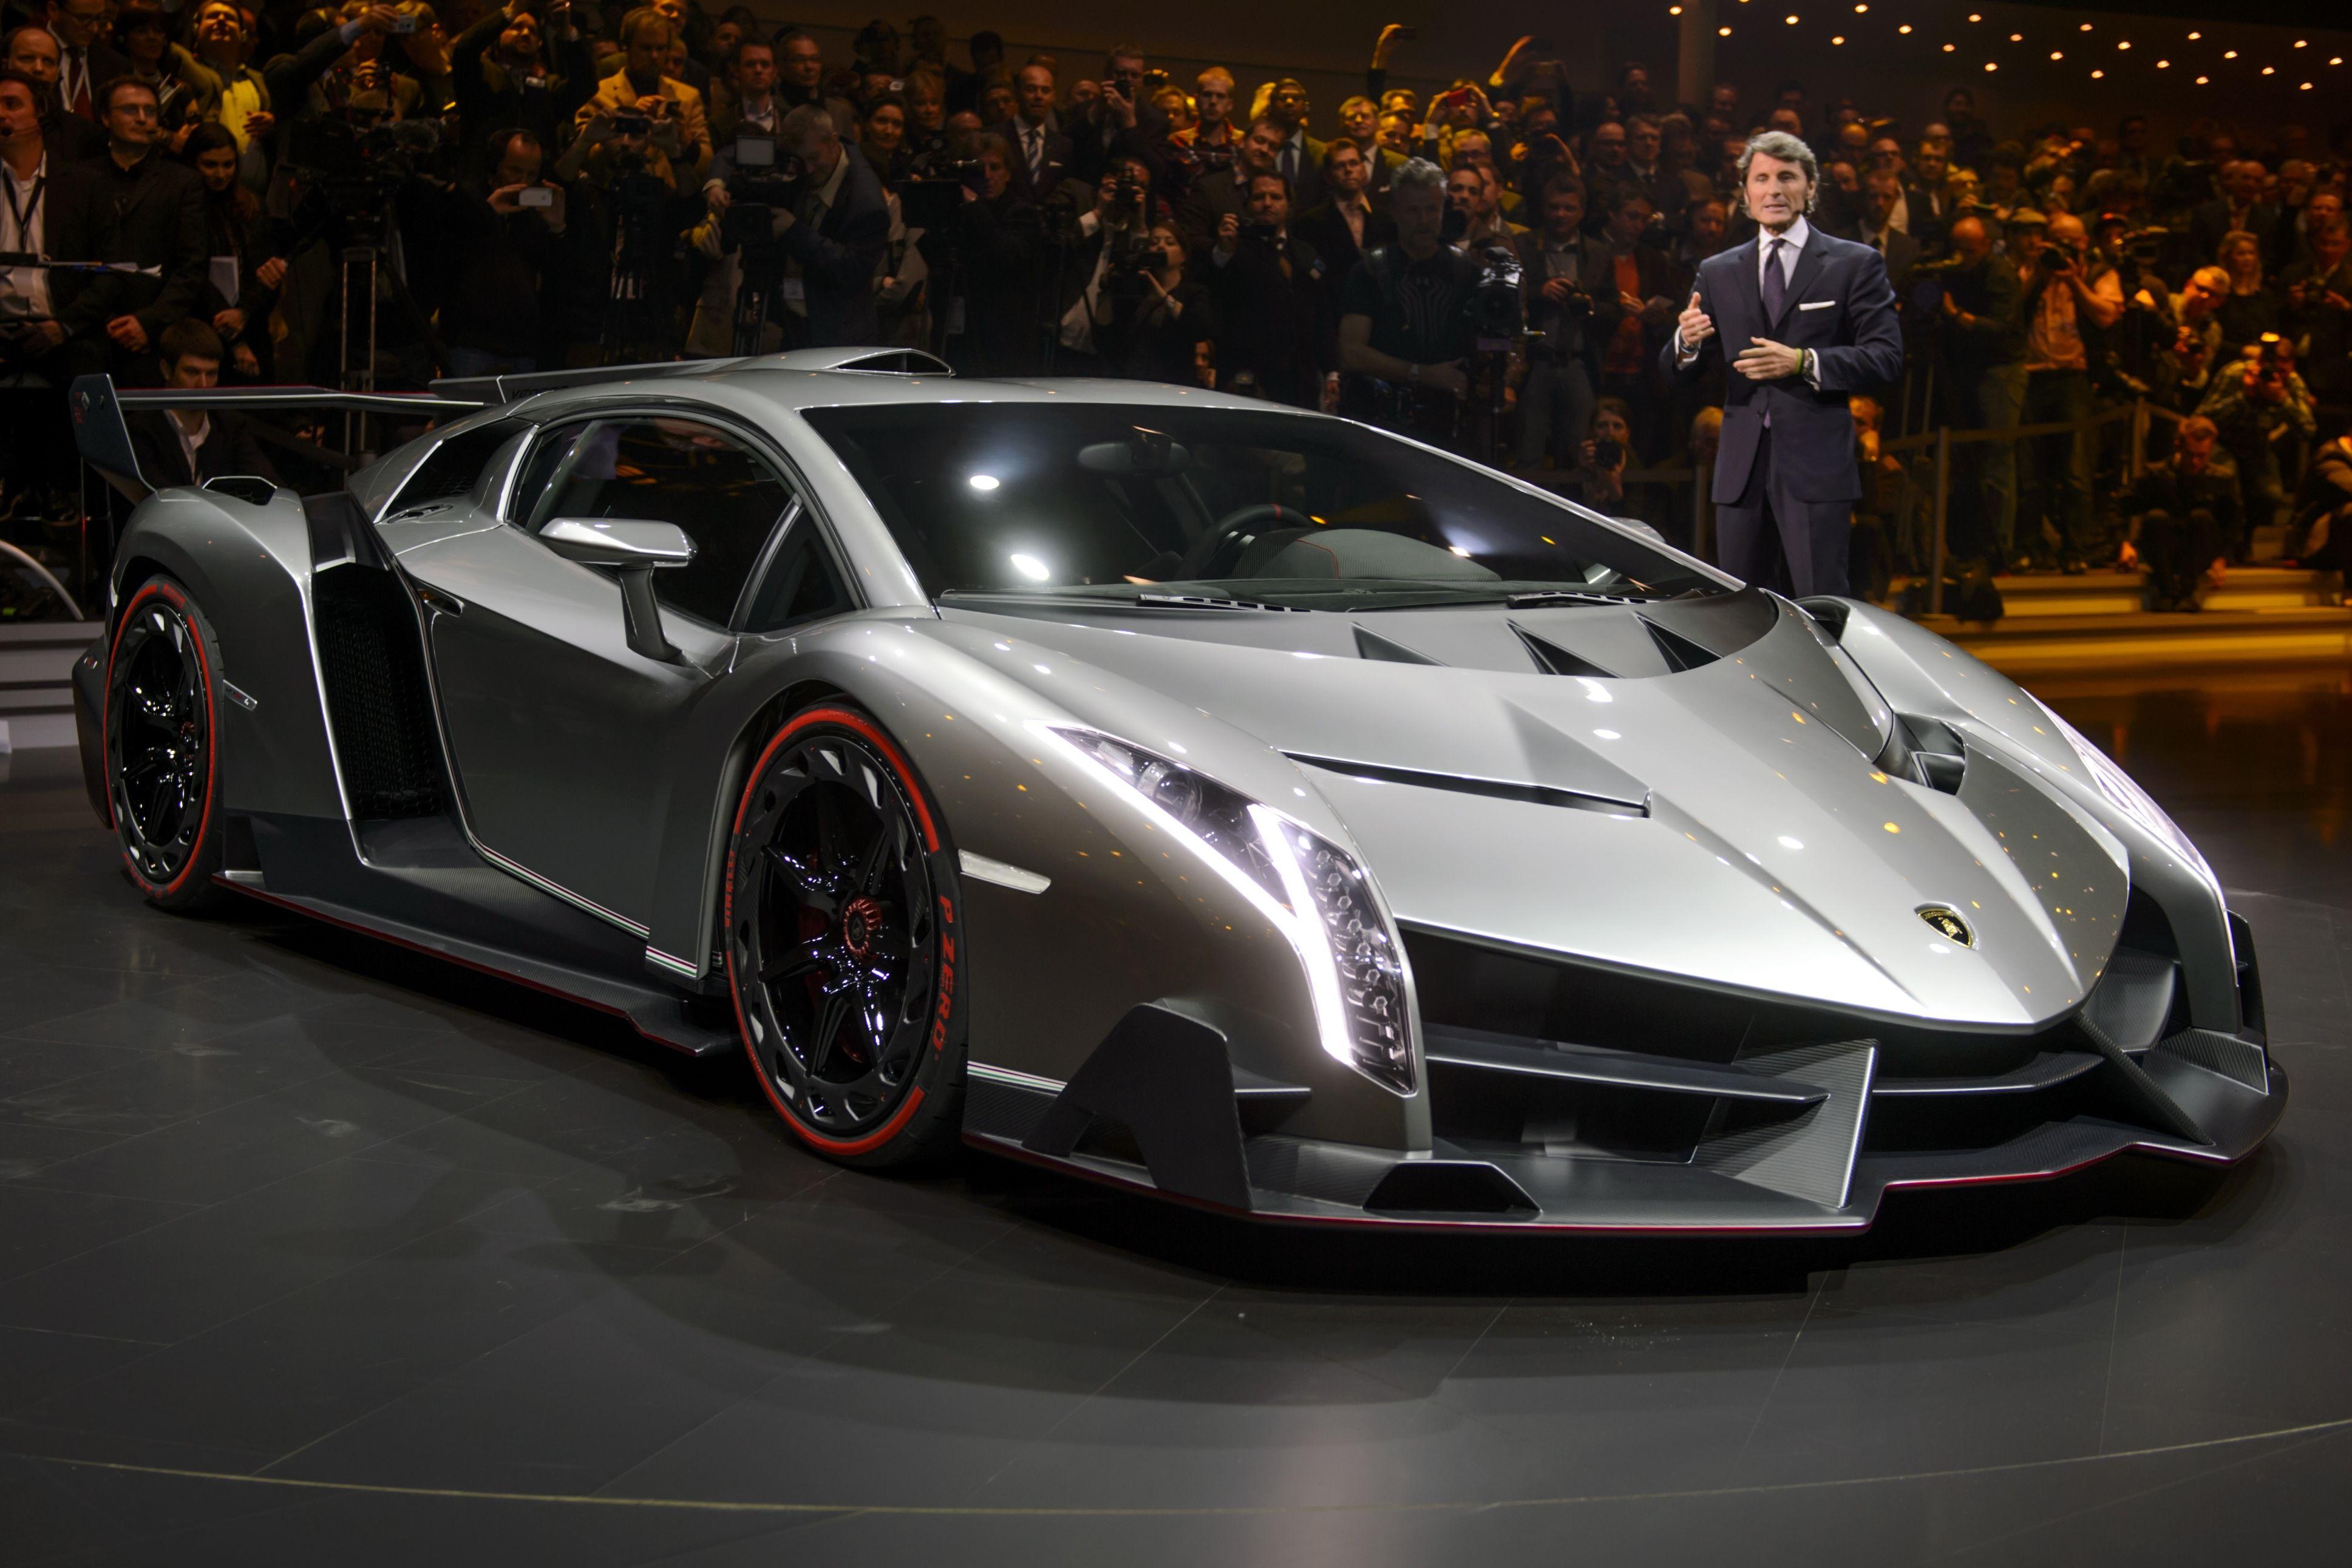 Photos Lamborghini S New 3 9 Million Veneno Supercar Lamborghini Veneno Lamborghini Cars Super Cars